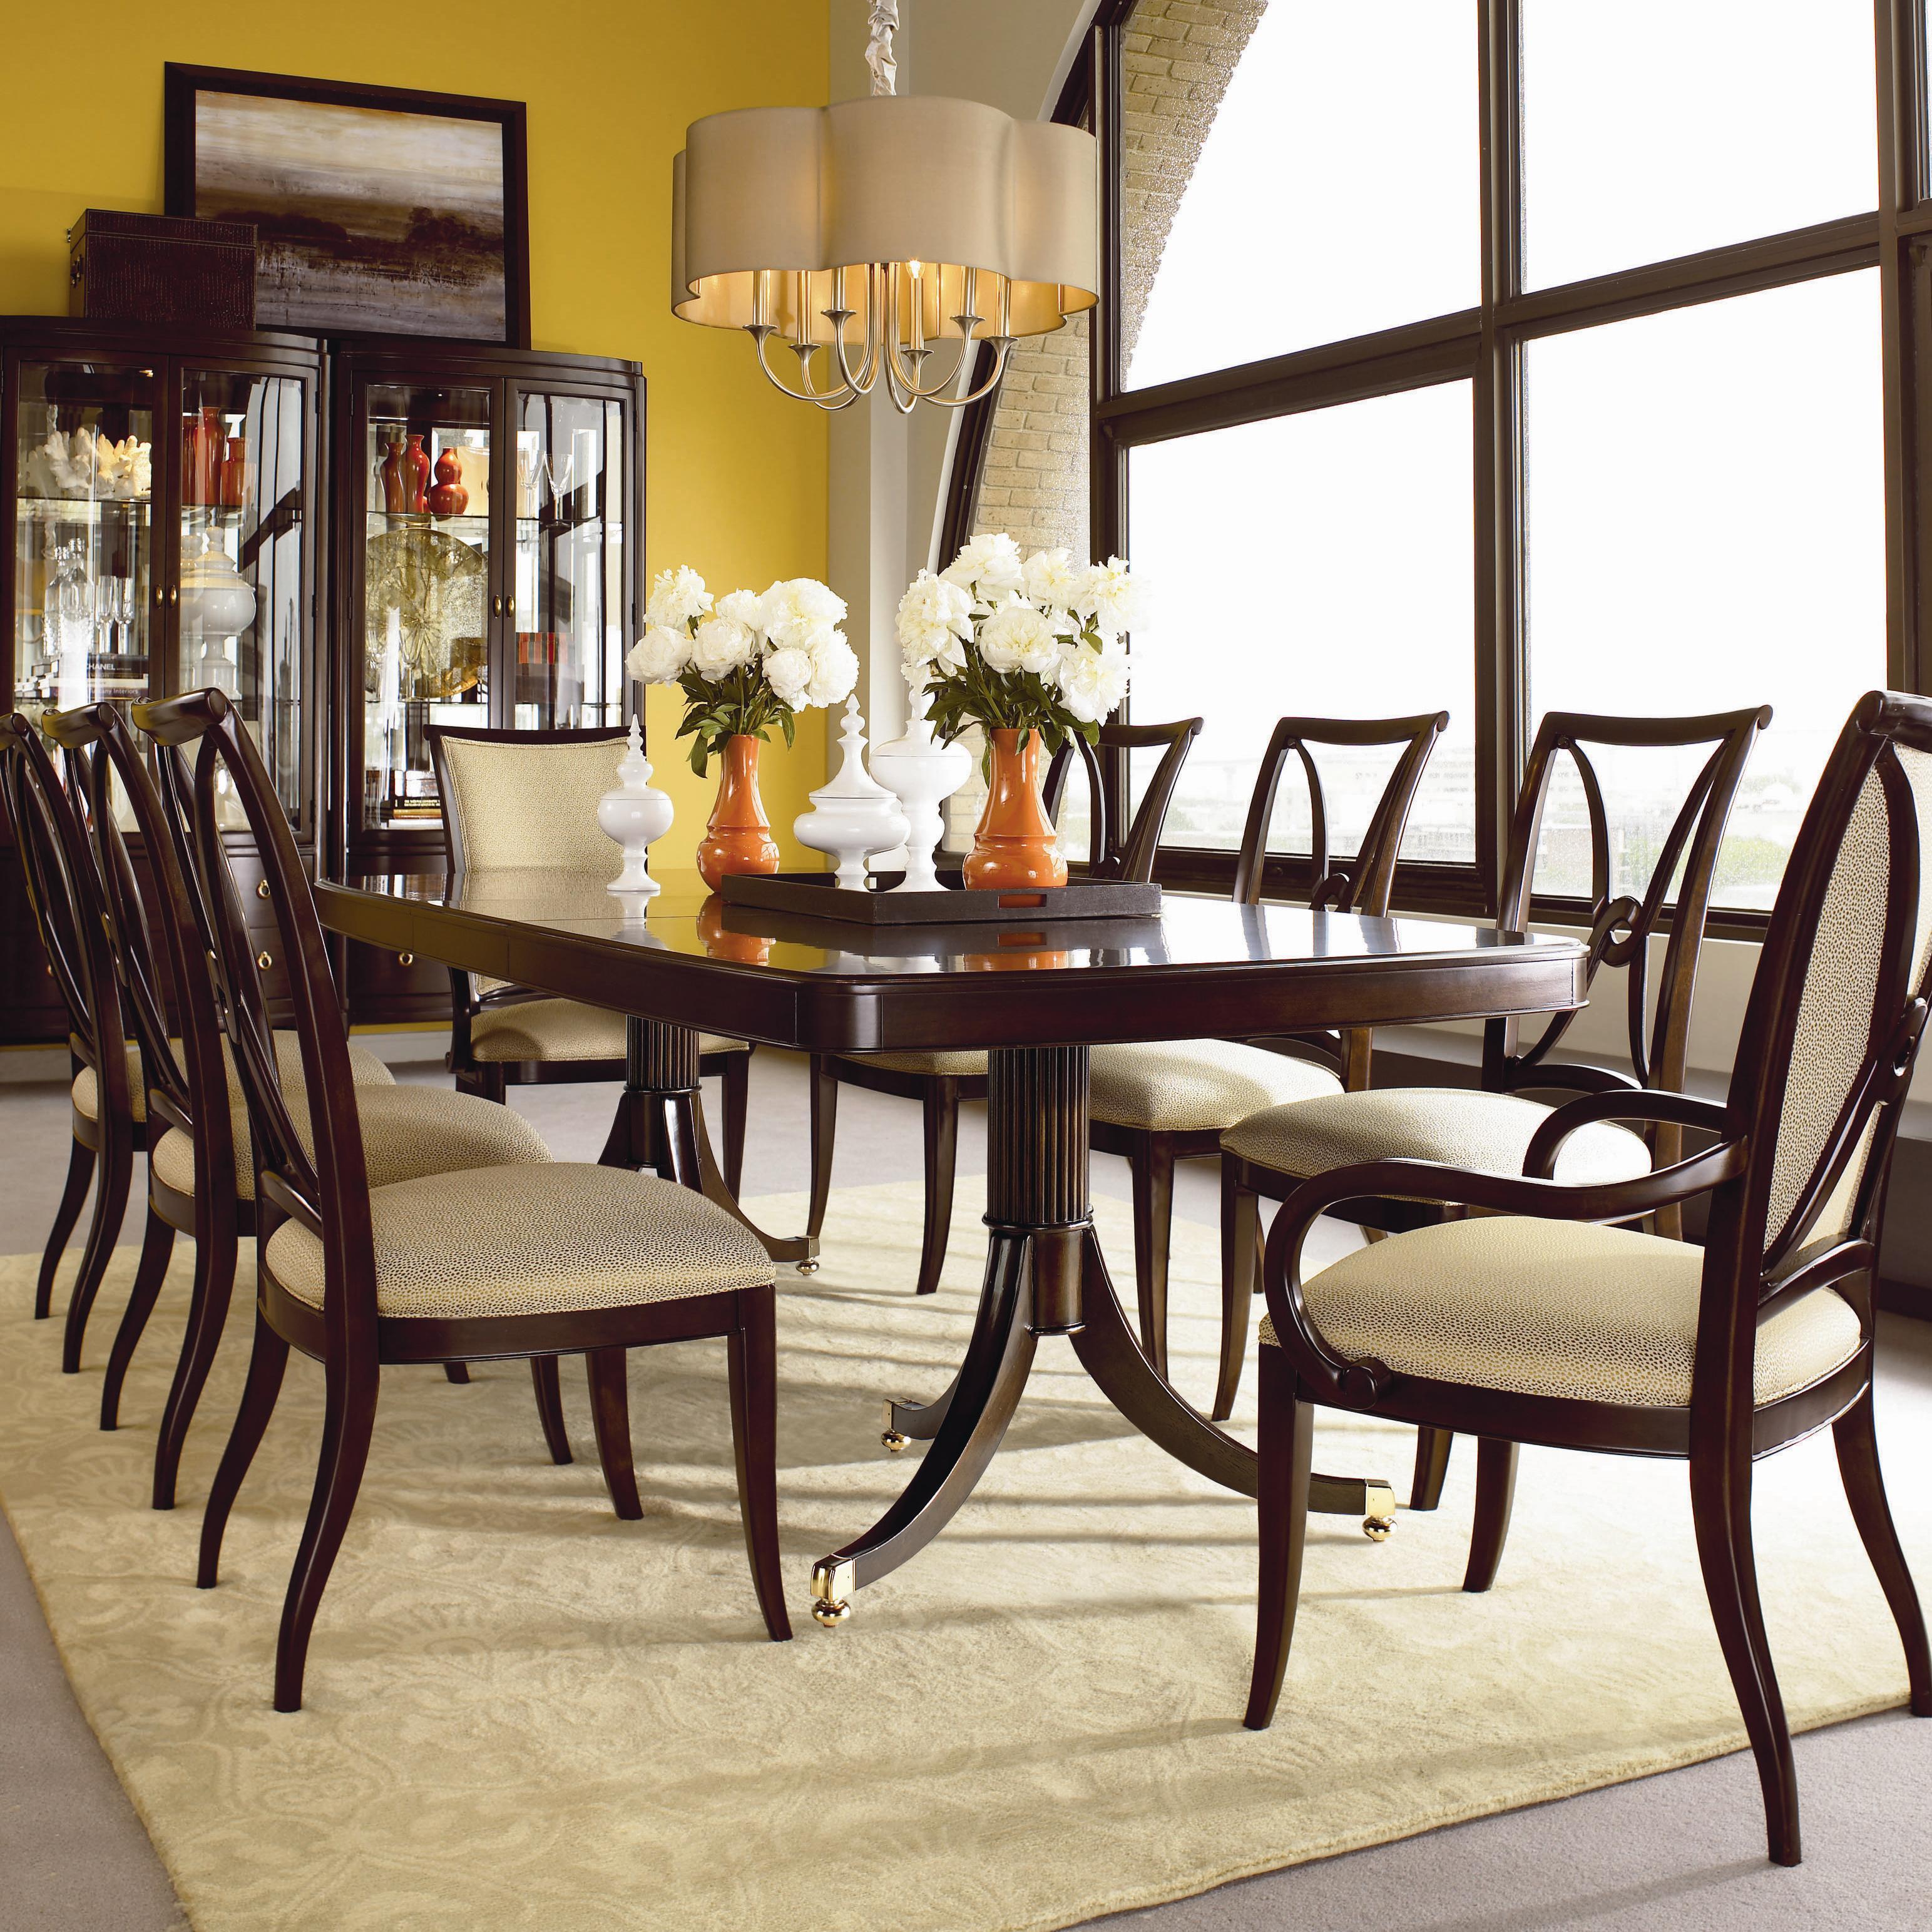 Thomasville® Studio 455 Nine Piece Double Pedestal Table Dining Set    Darvin Furniture   Dining 7 (or More) Piece Set